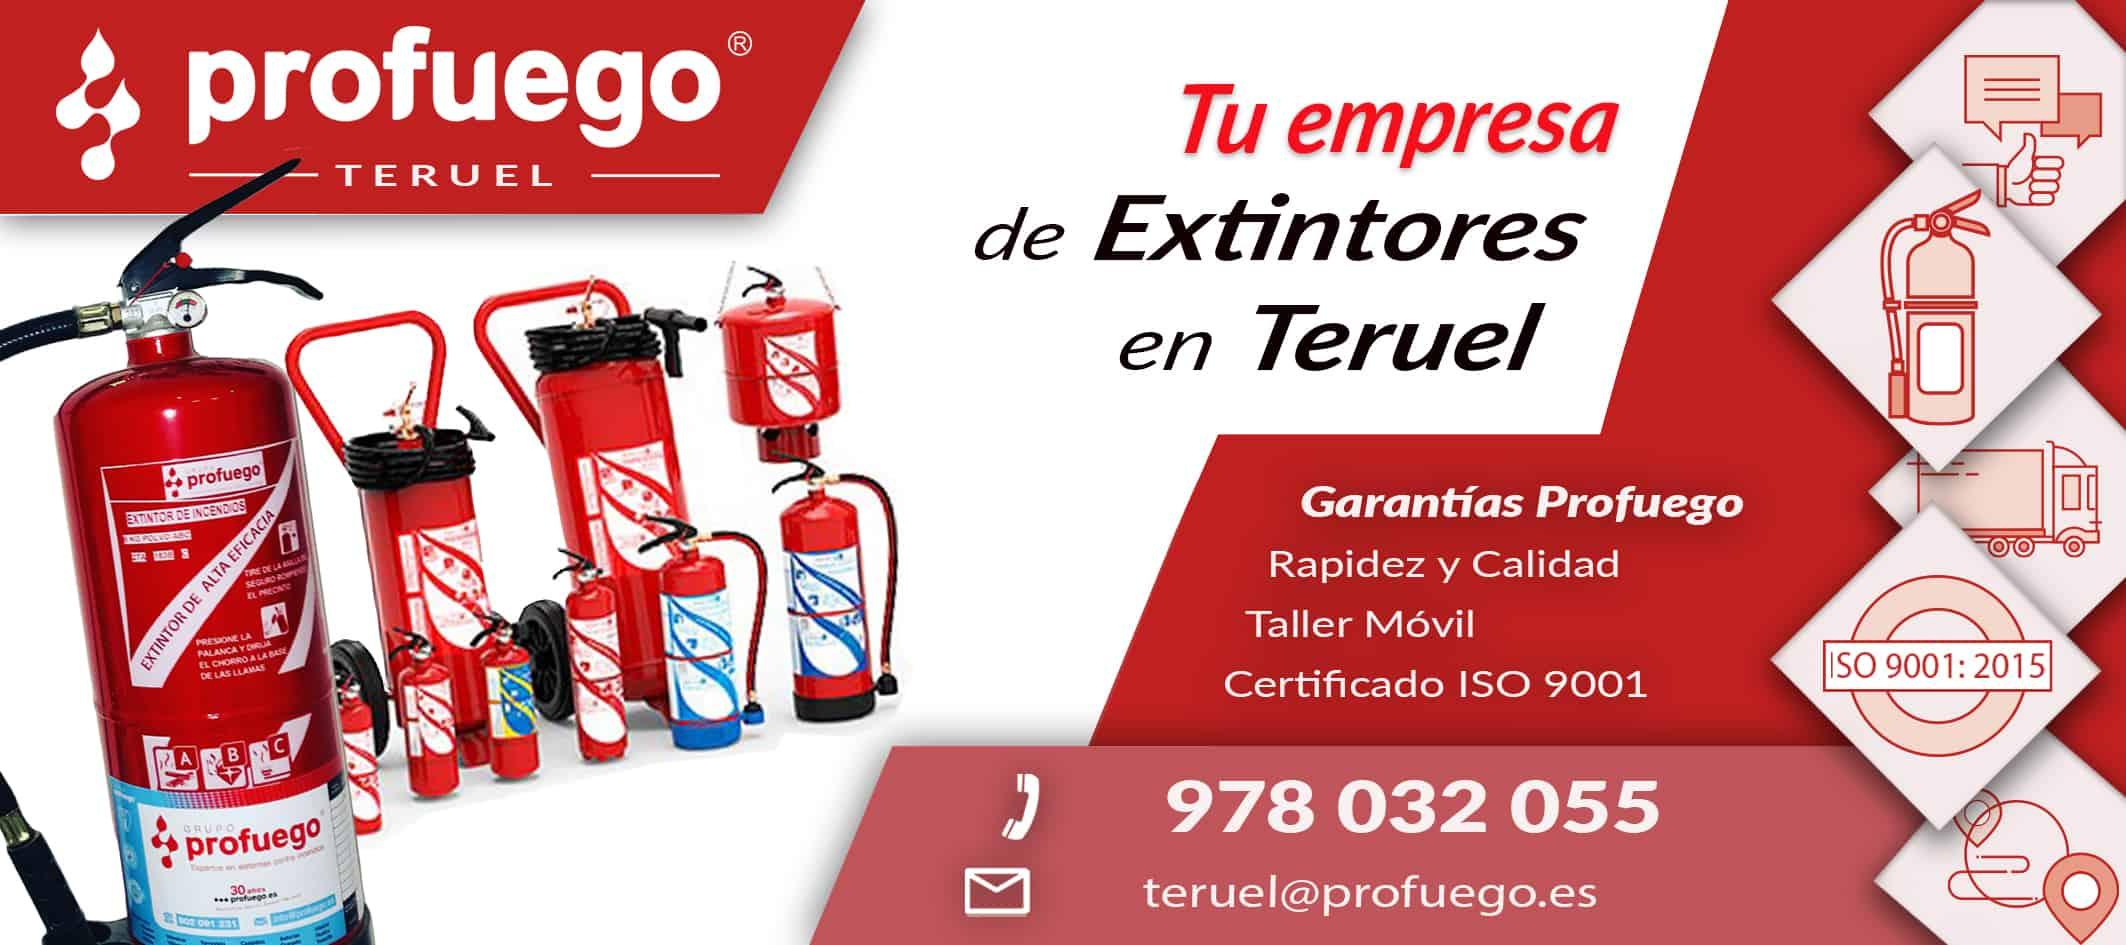 extintores teruel